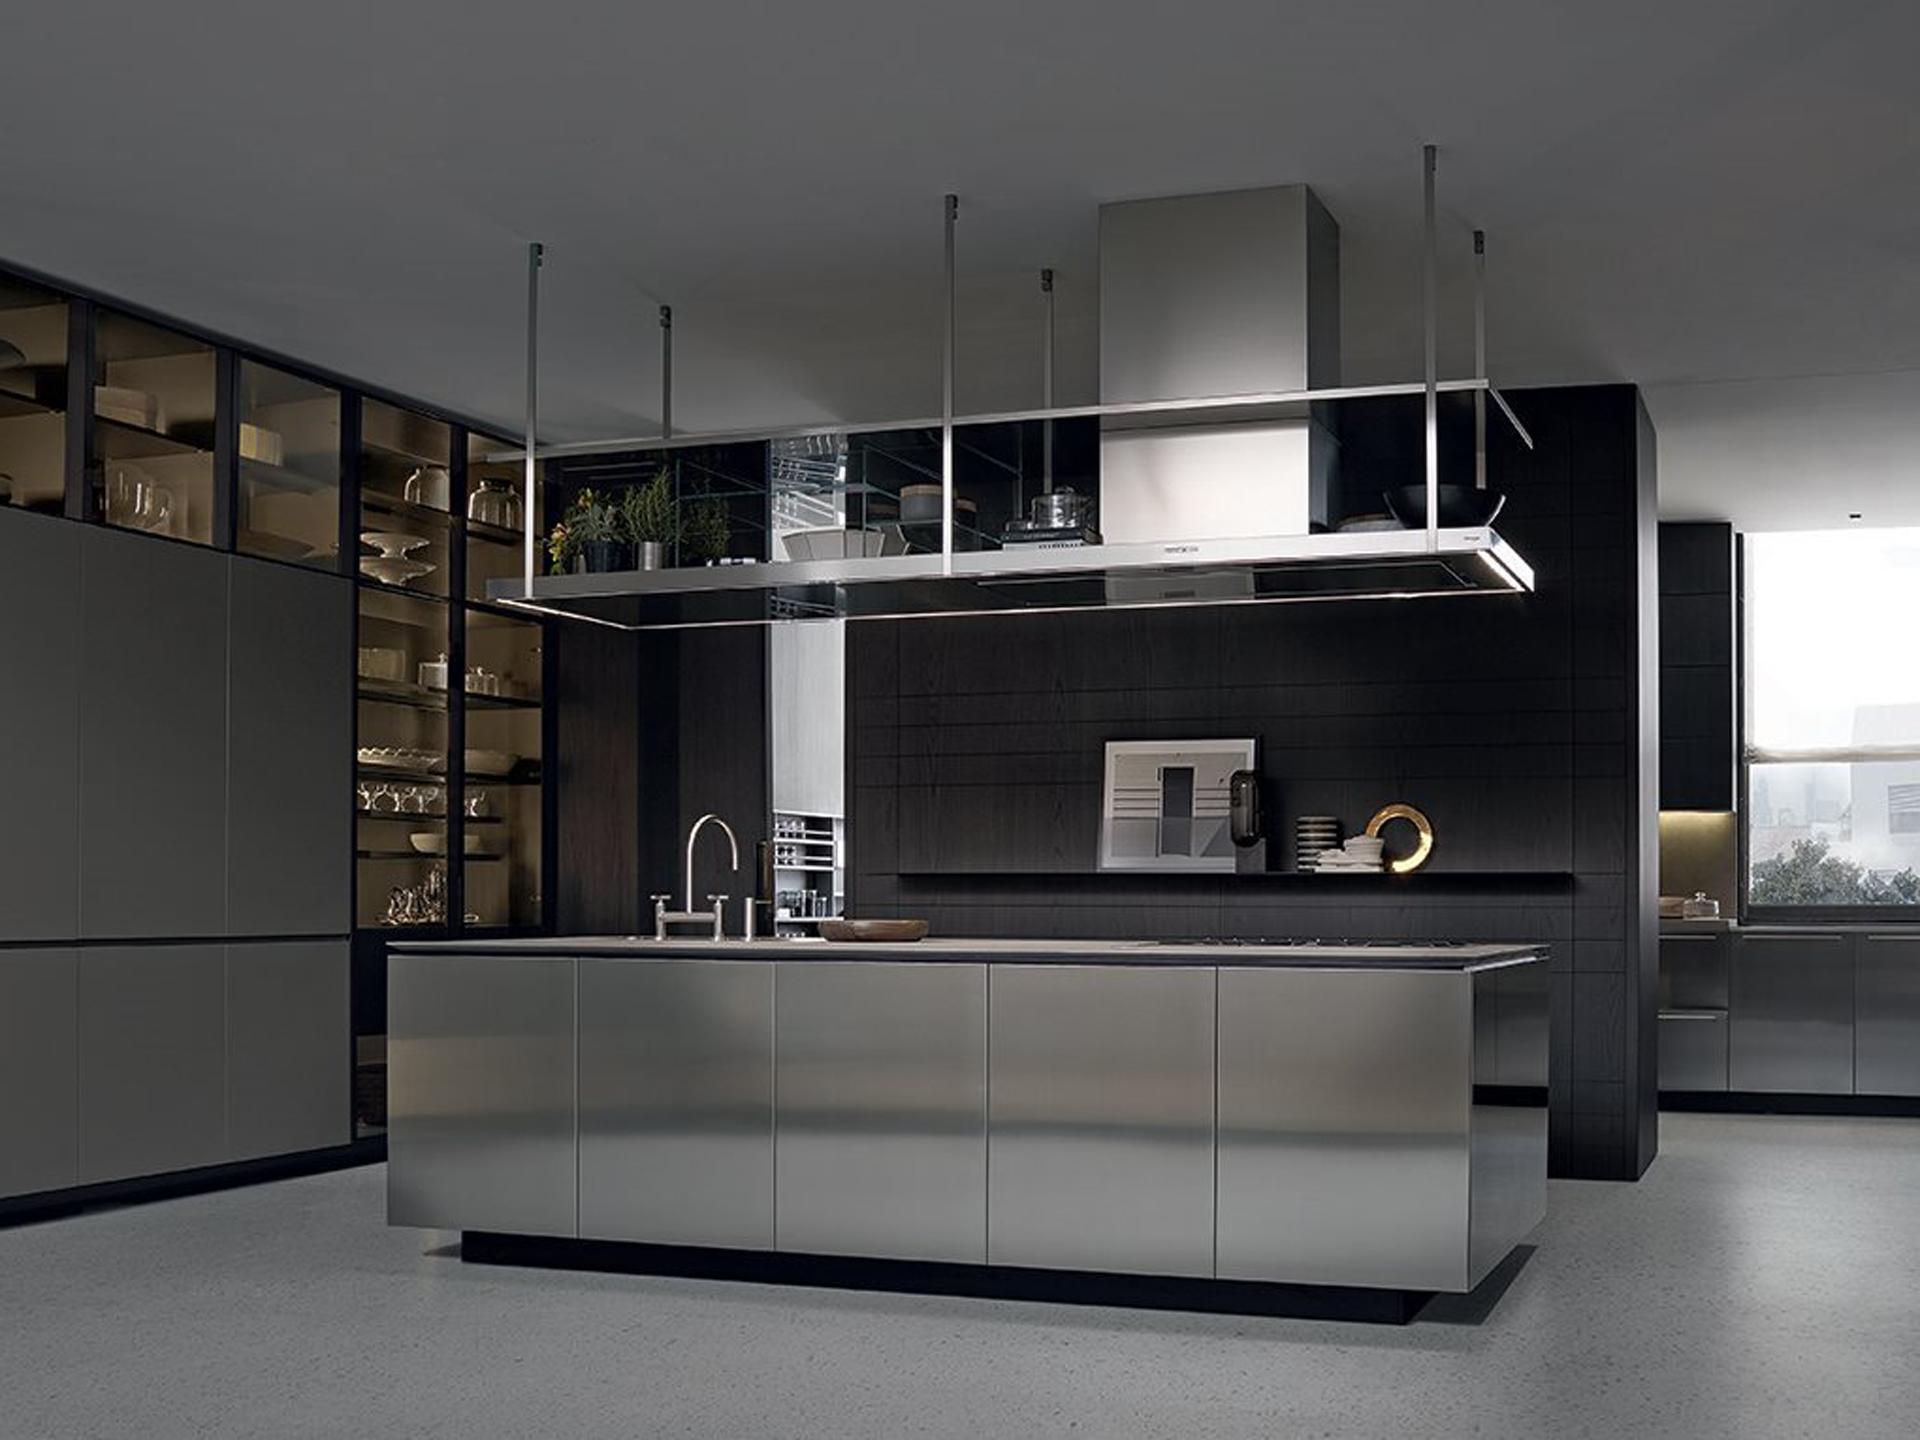 Sesamo showroom prodotti varenna artex - Cucina artex varenna ...